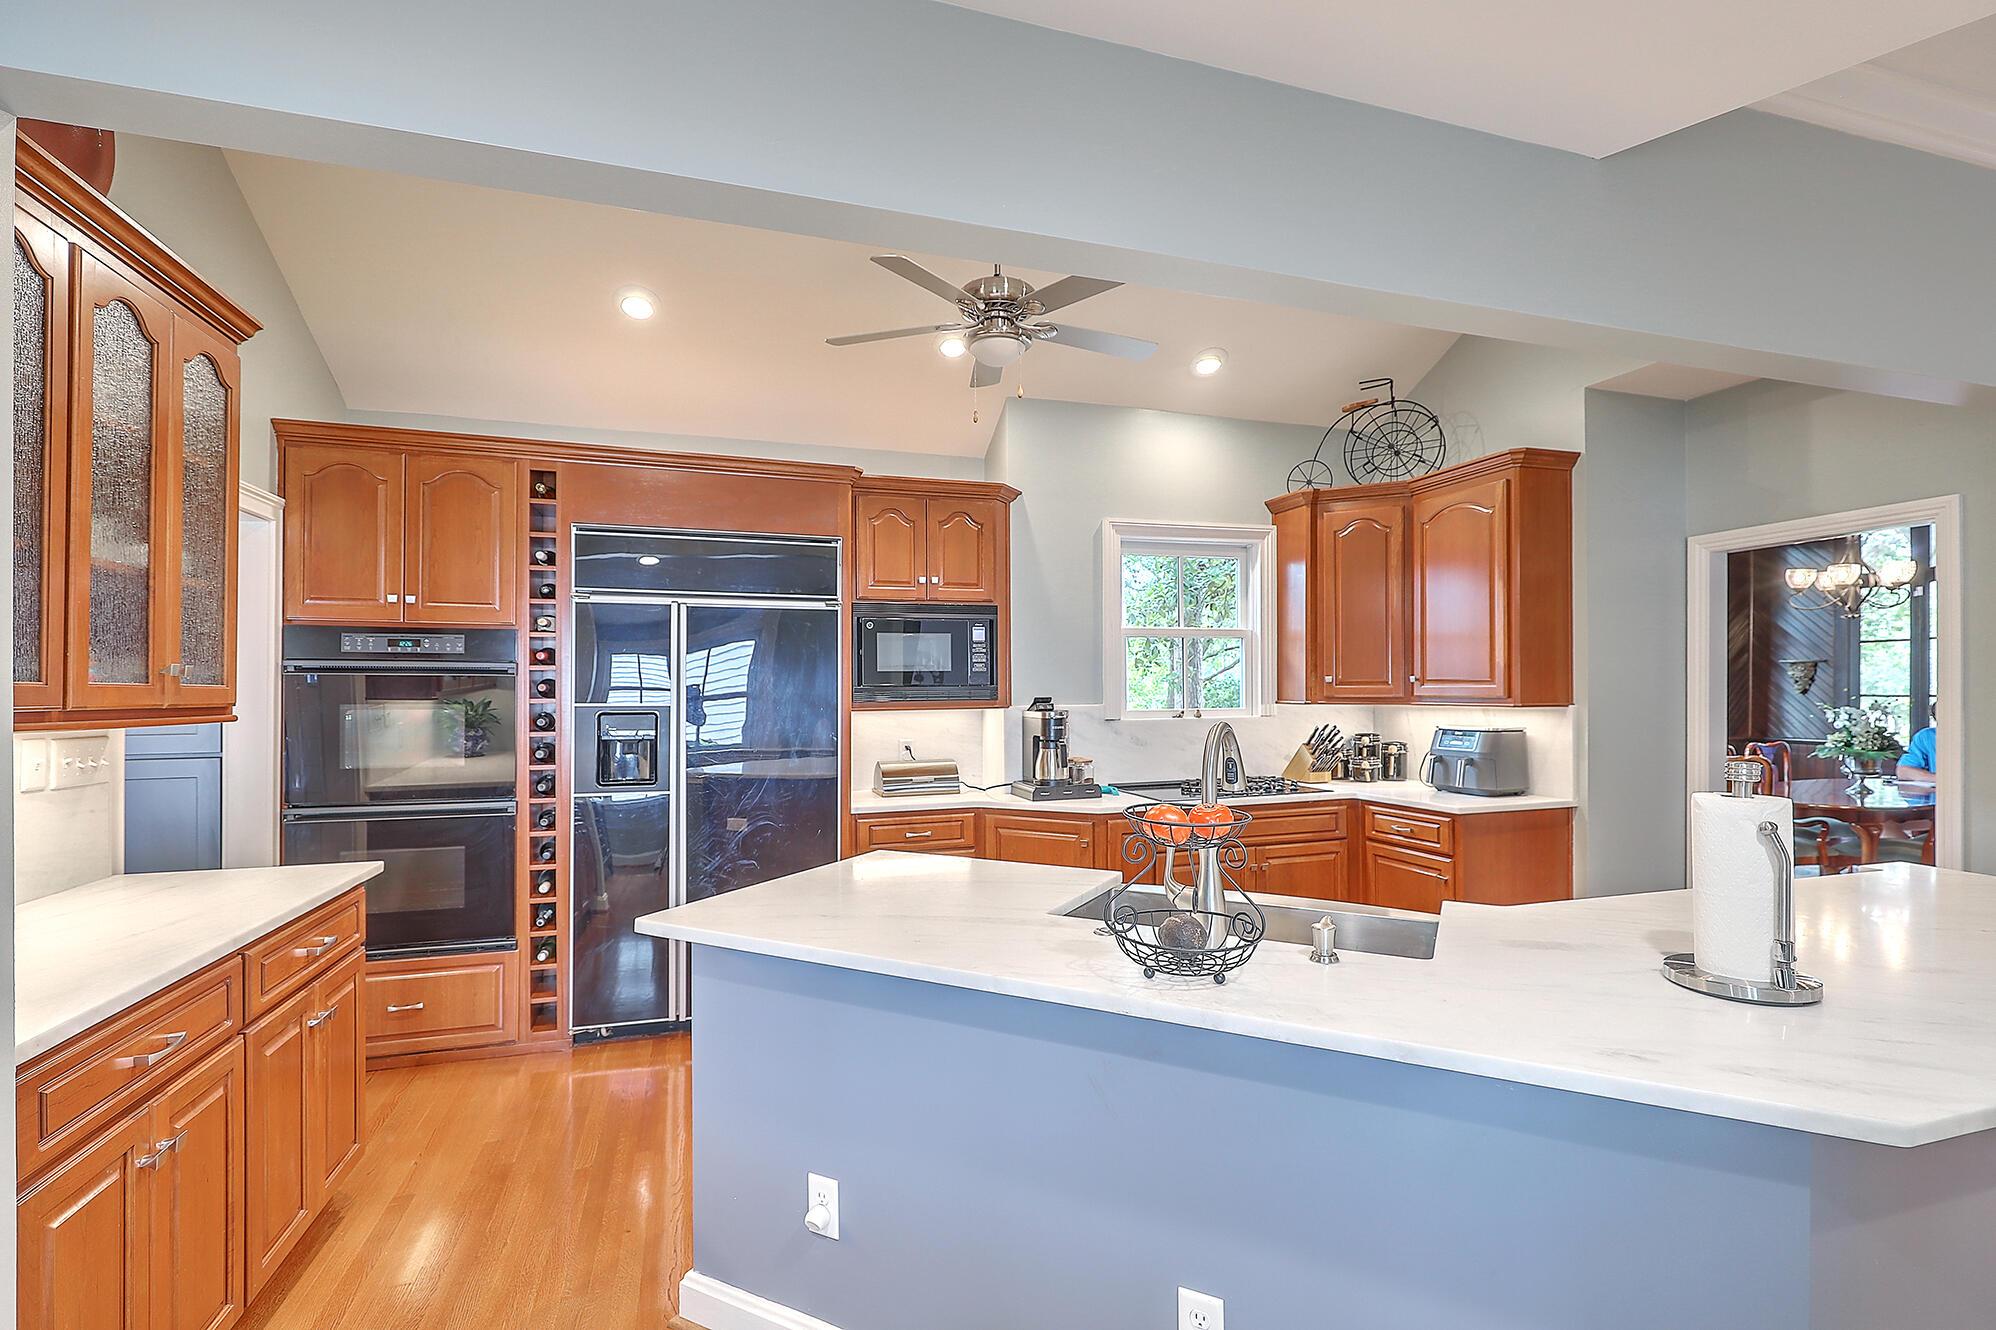 Summerville Homes For Sale - 102 Hickory, Summerville, SC - 49